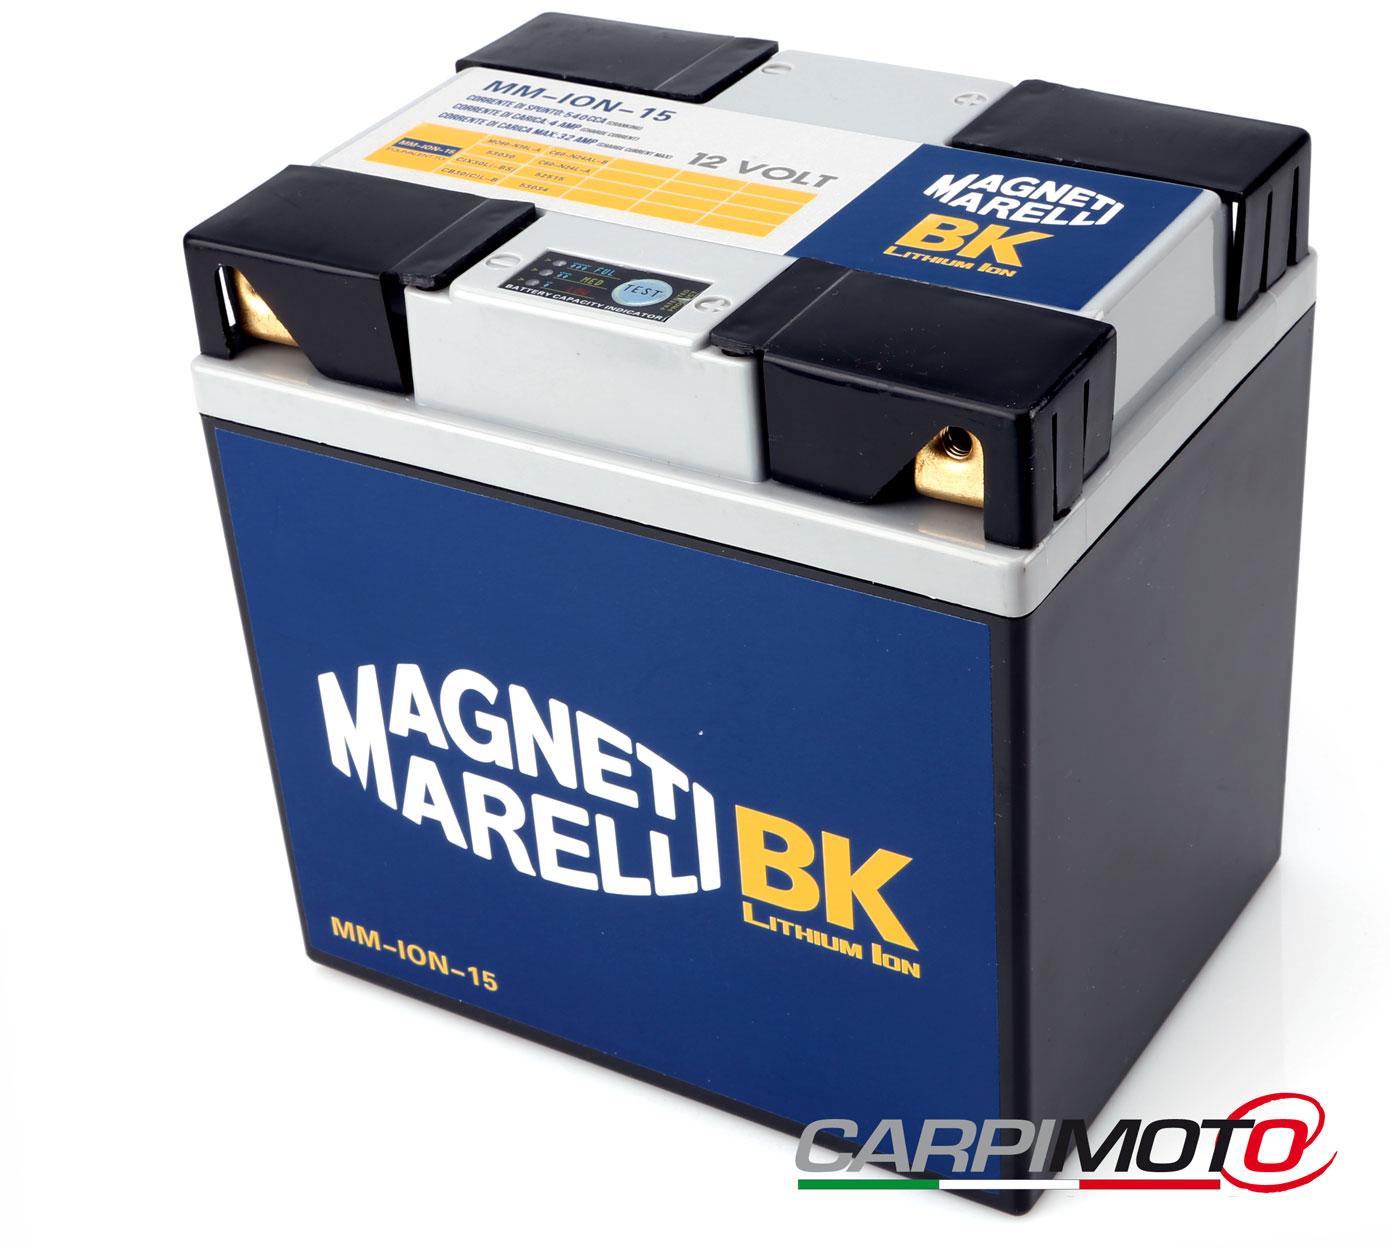 magneti marelli lithium battery mmtx30 4. Black Bedroom Furniture Sets. Home Design Ideas